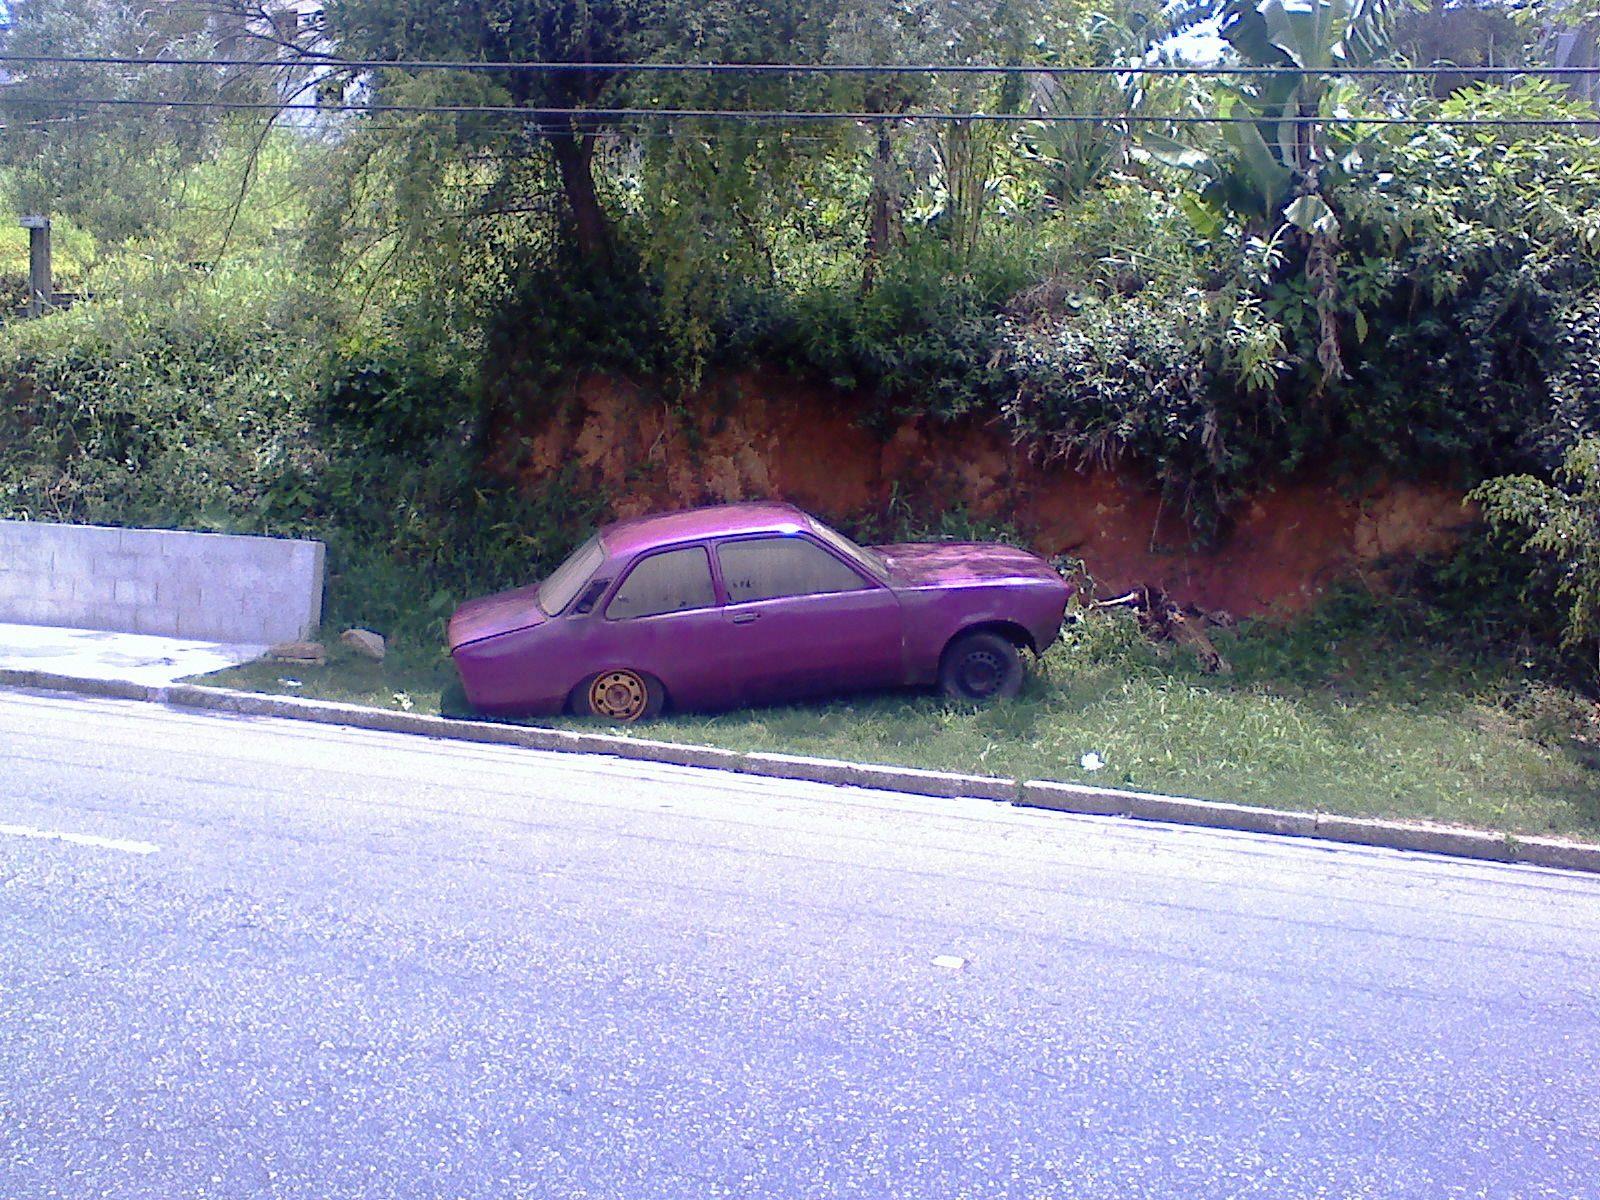 uluana-giampietro-chevette-ribeirc3a3o-pires-sp Chevrolet Chevette